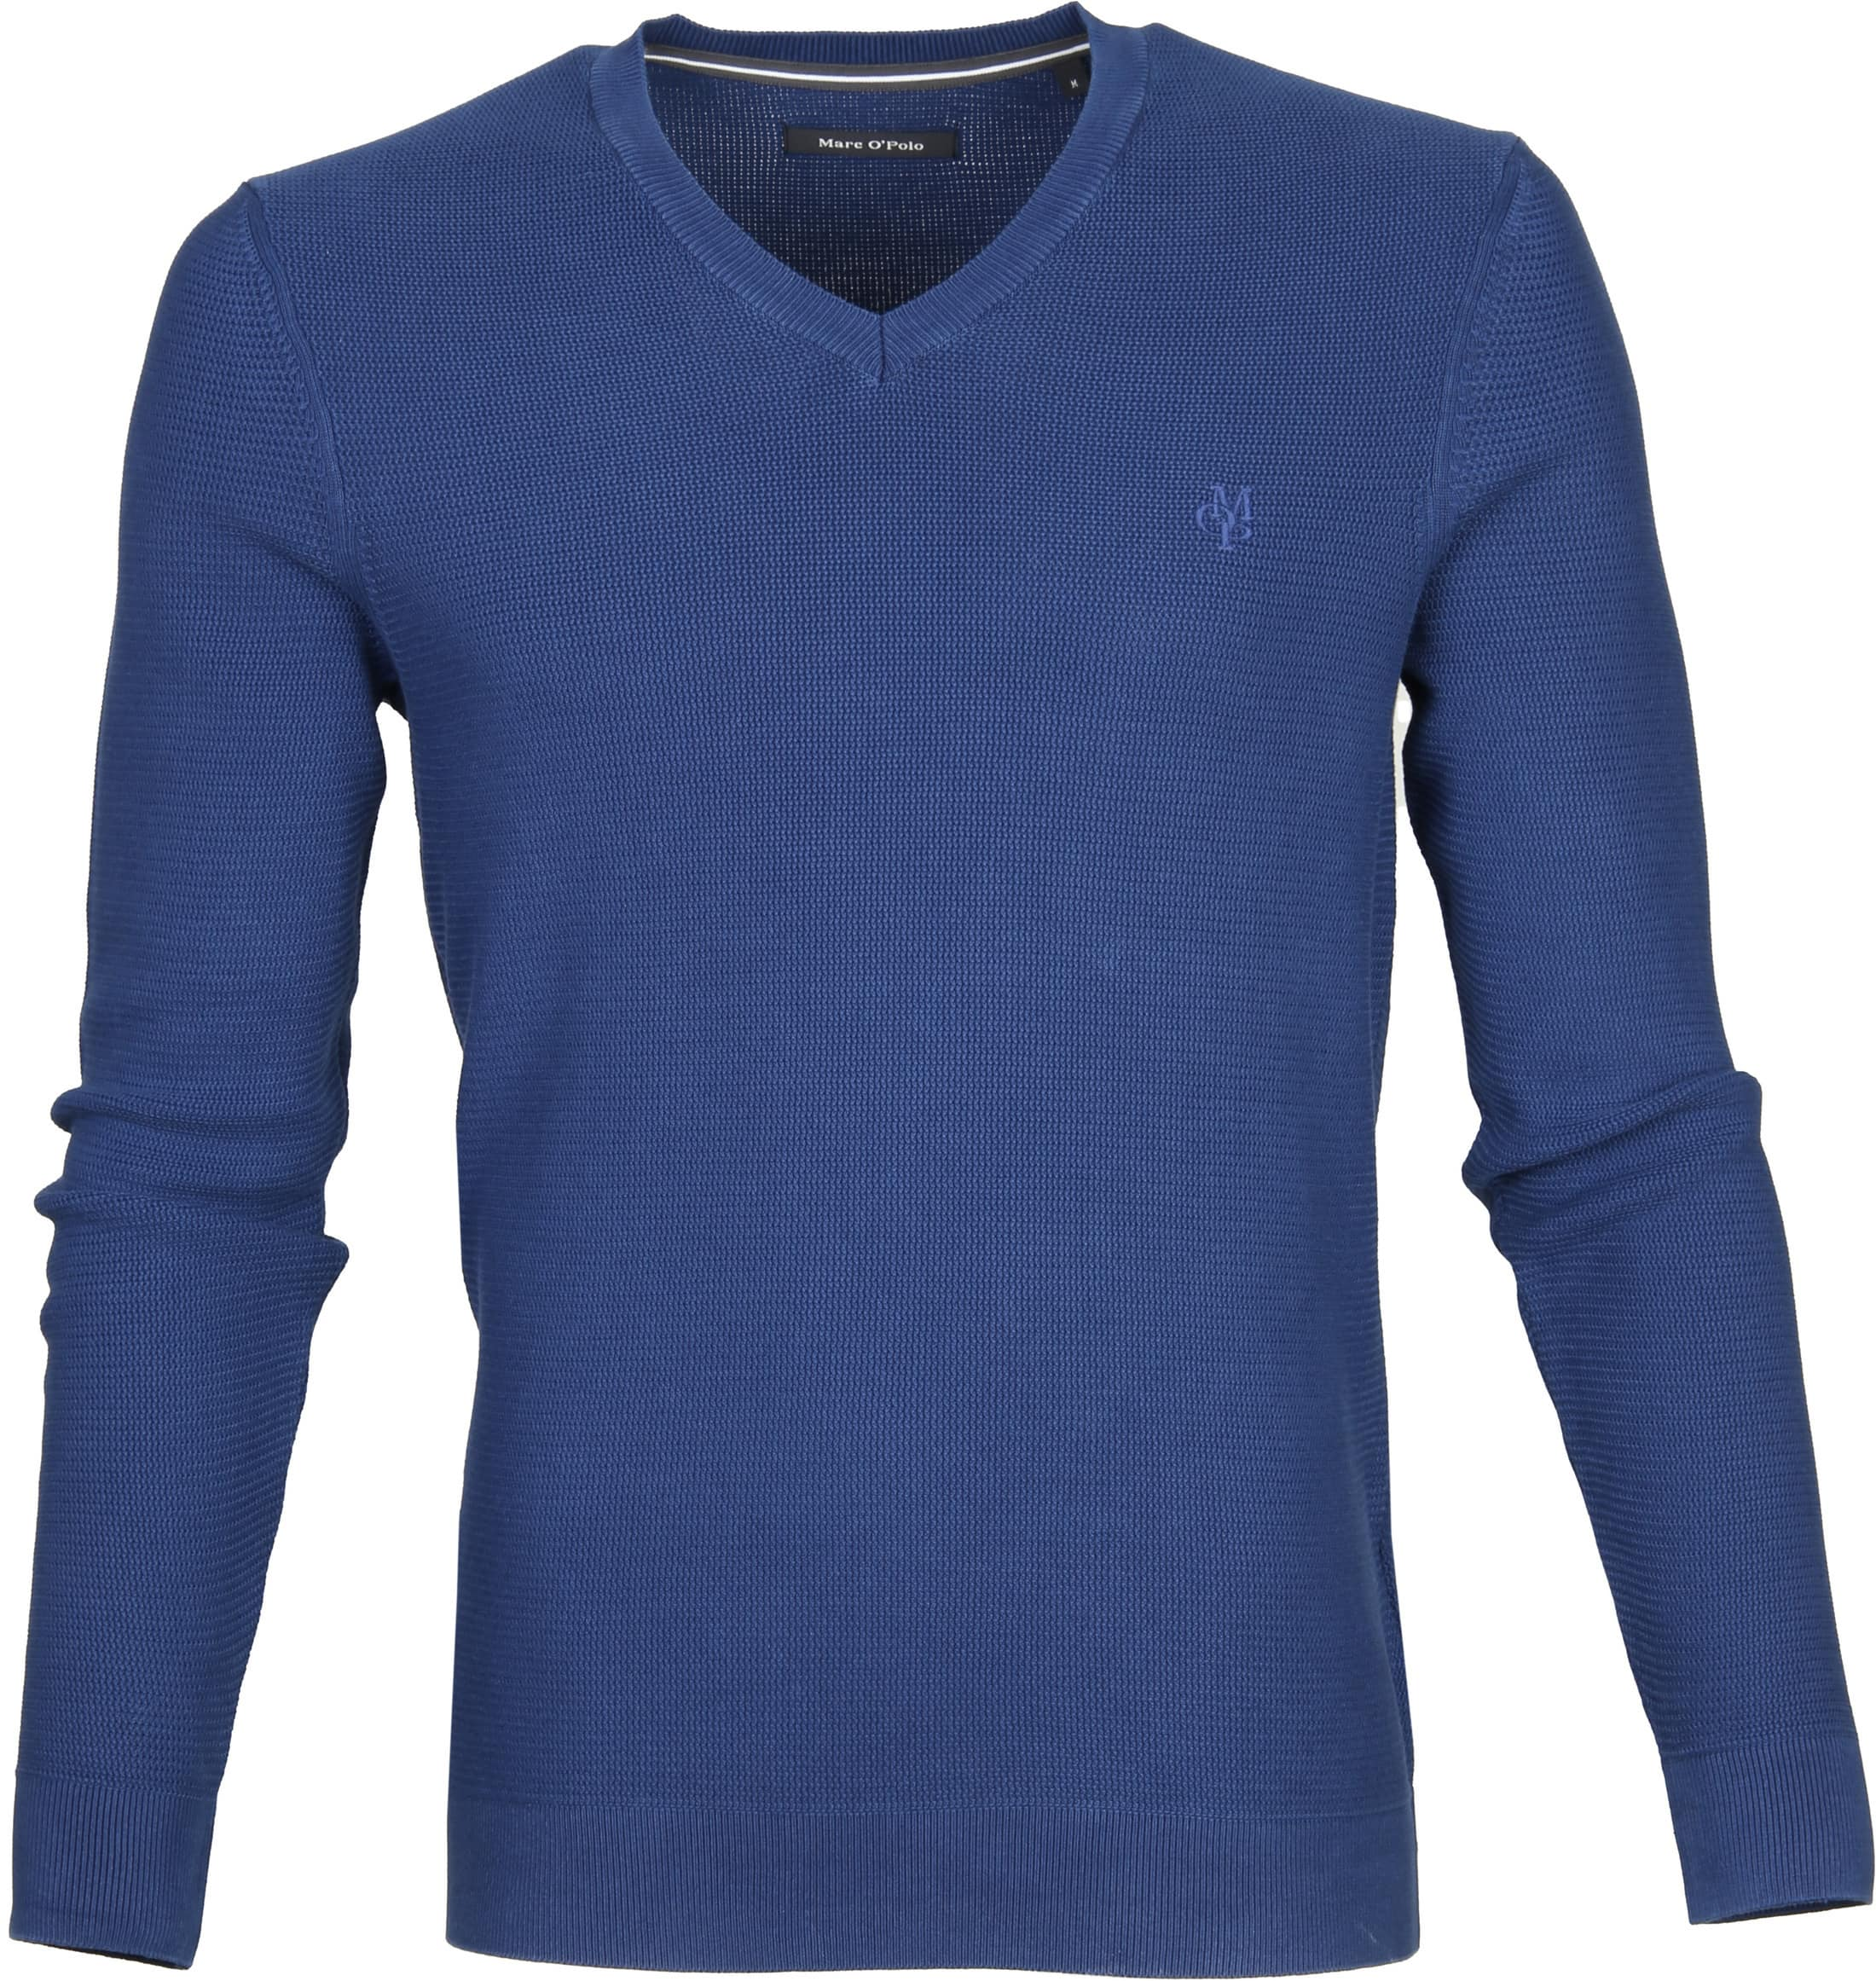 Marc O'Polo Pullover Blauw Katoen foto 0